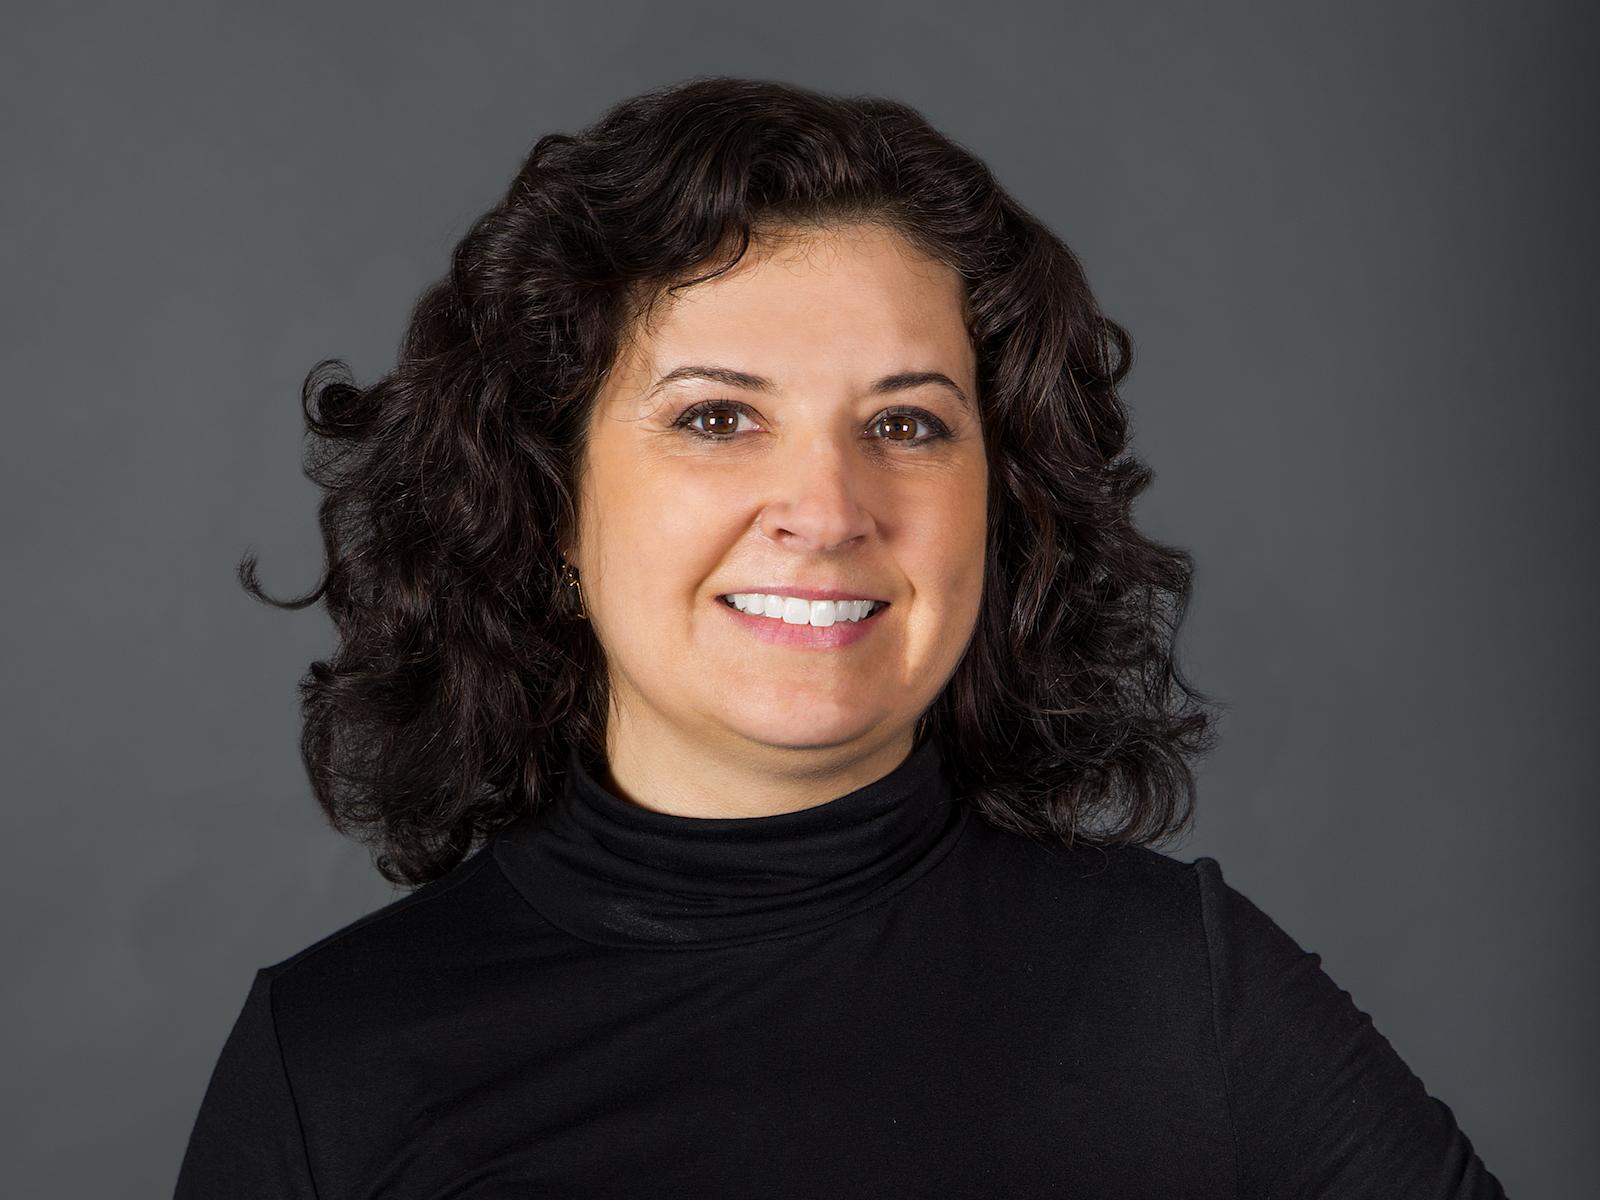 AnimalBiome Has a New Molecular Biologist! Introducing Kirsten Copren